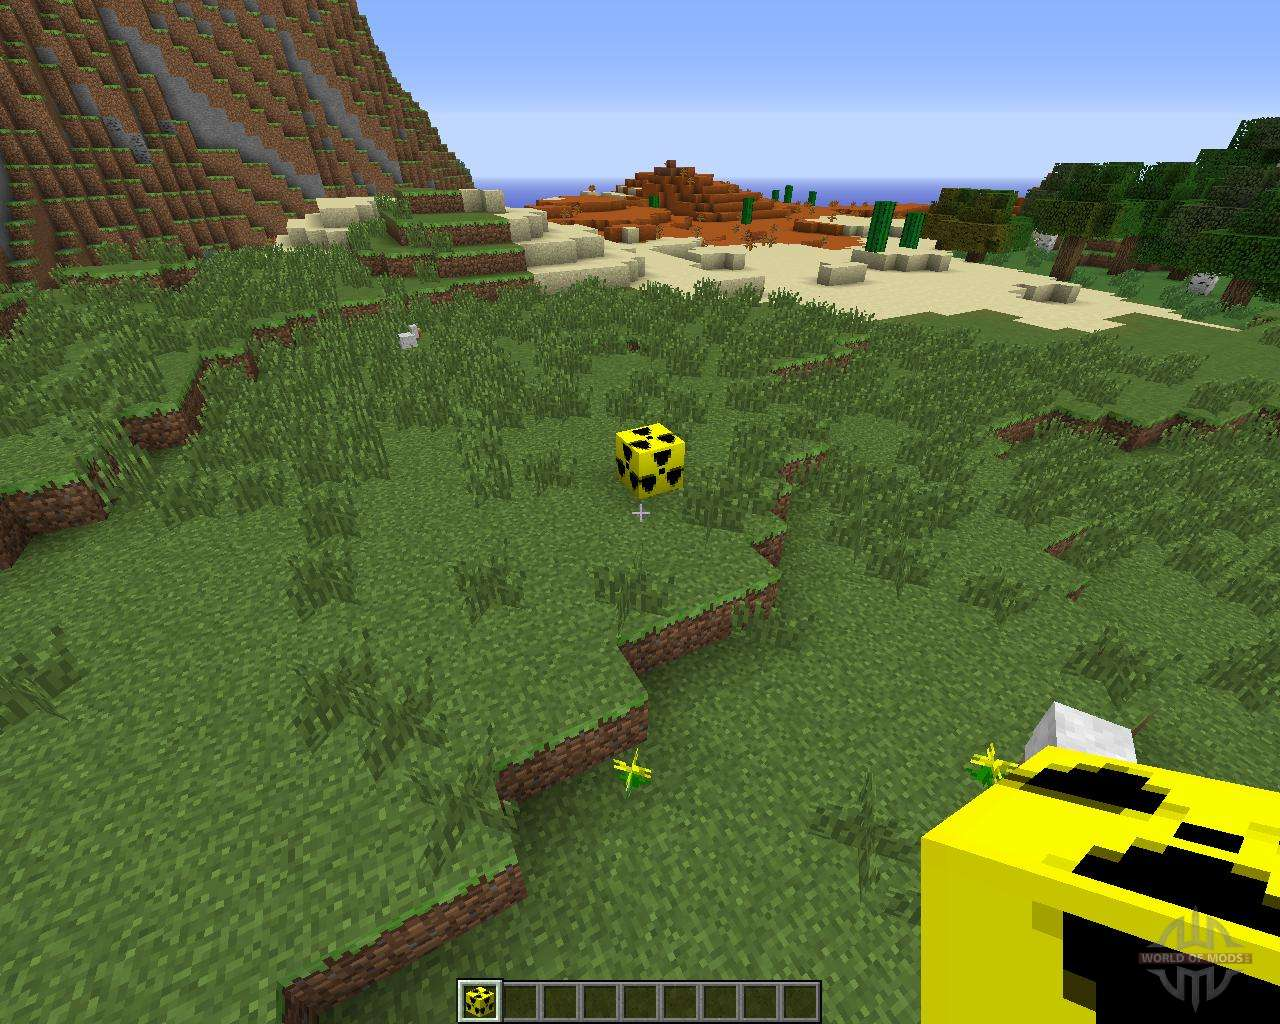 Explosives+ Mod For Minecraft 1.8.1/1.8/1.7.10